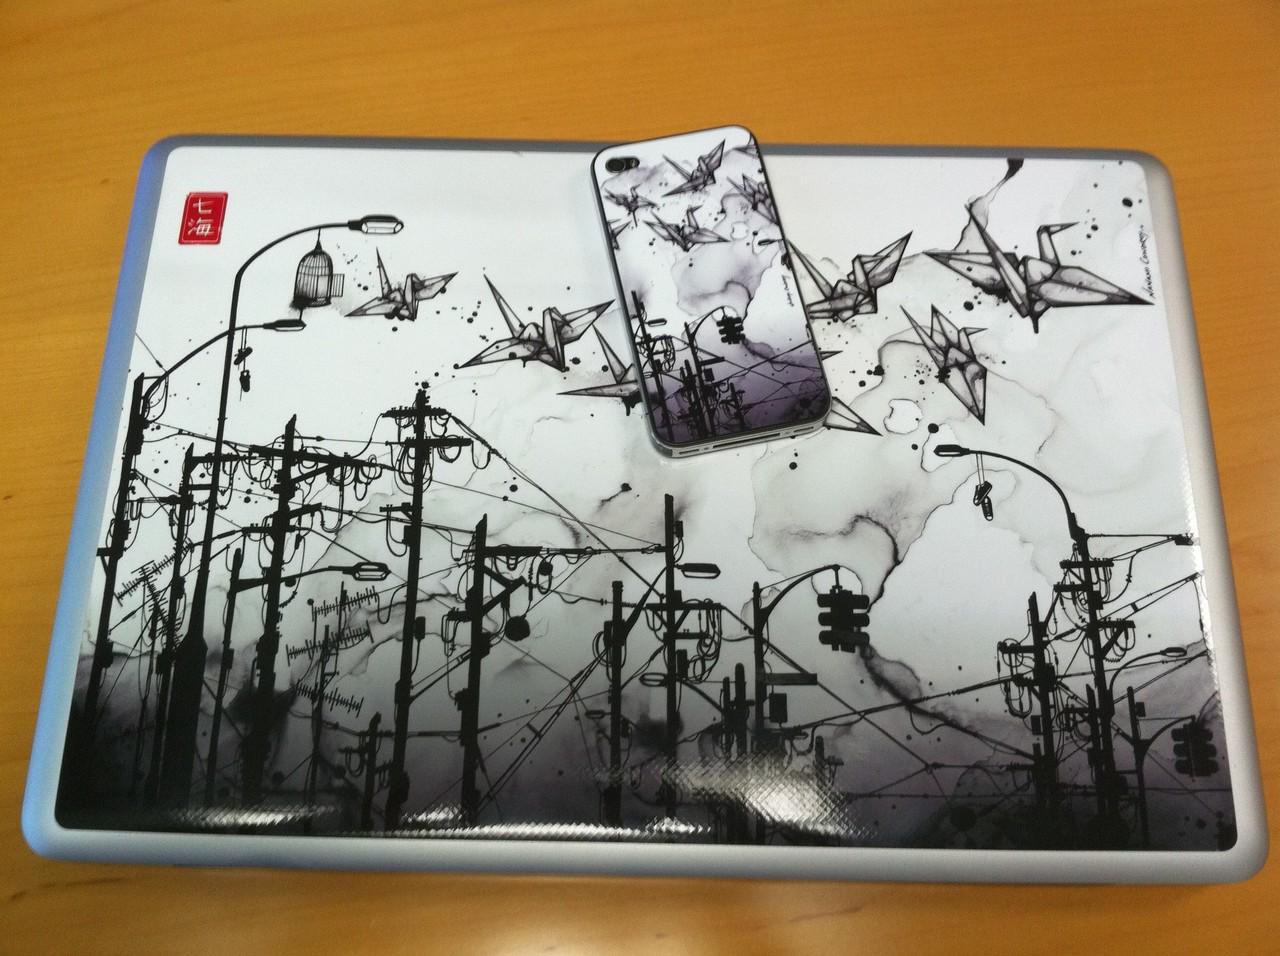 Dual Gelaskins - iPhone 4 and Macbook Pro http://gelaskins.com/artists/Nanami_Cowdroy